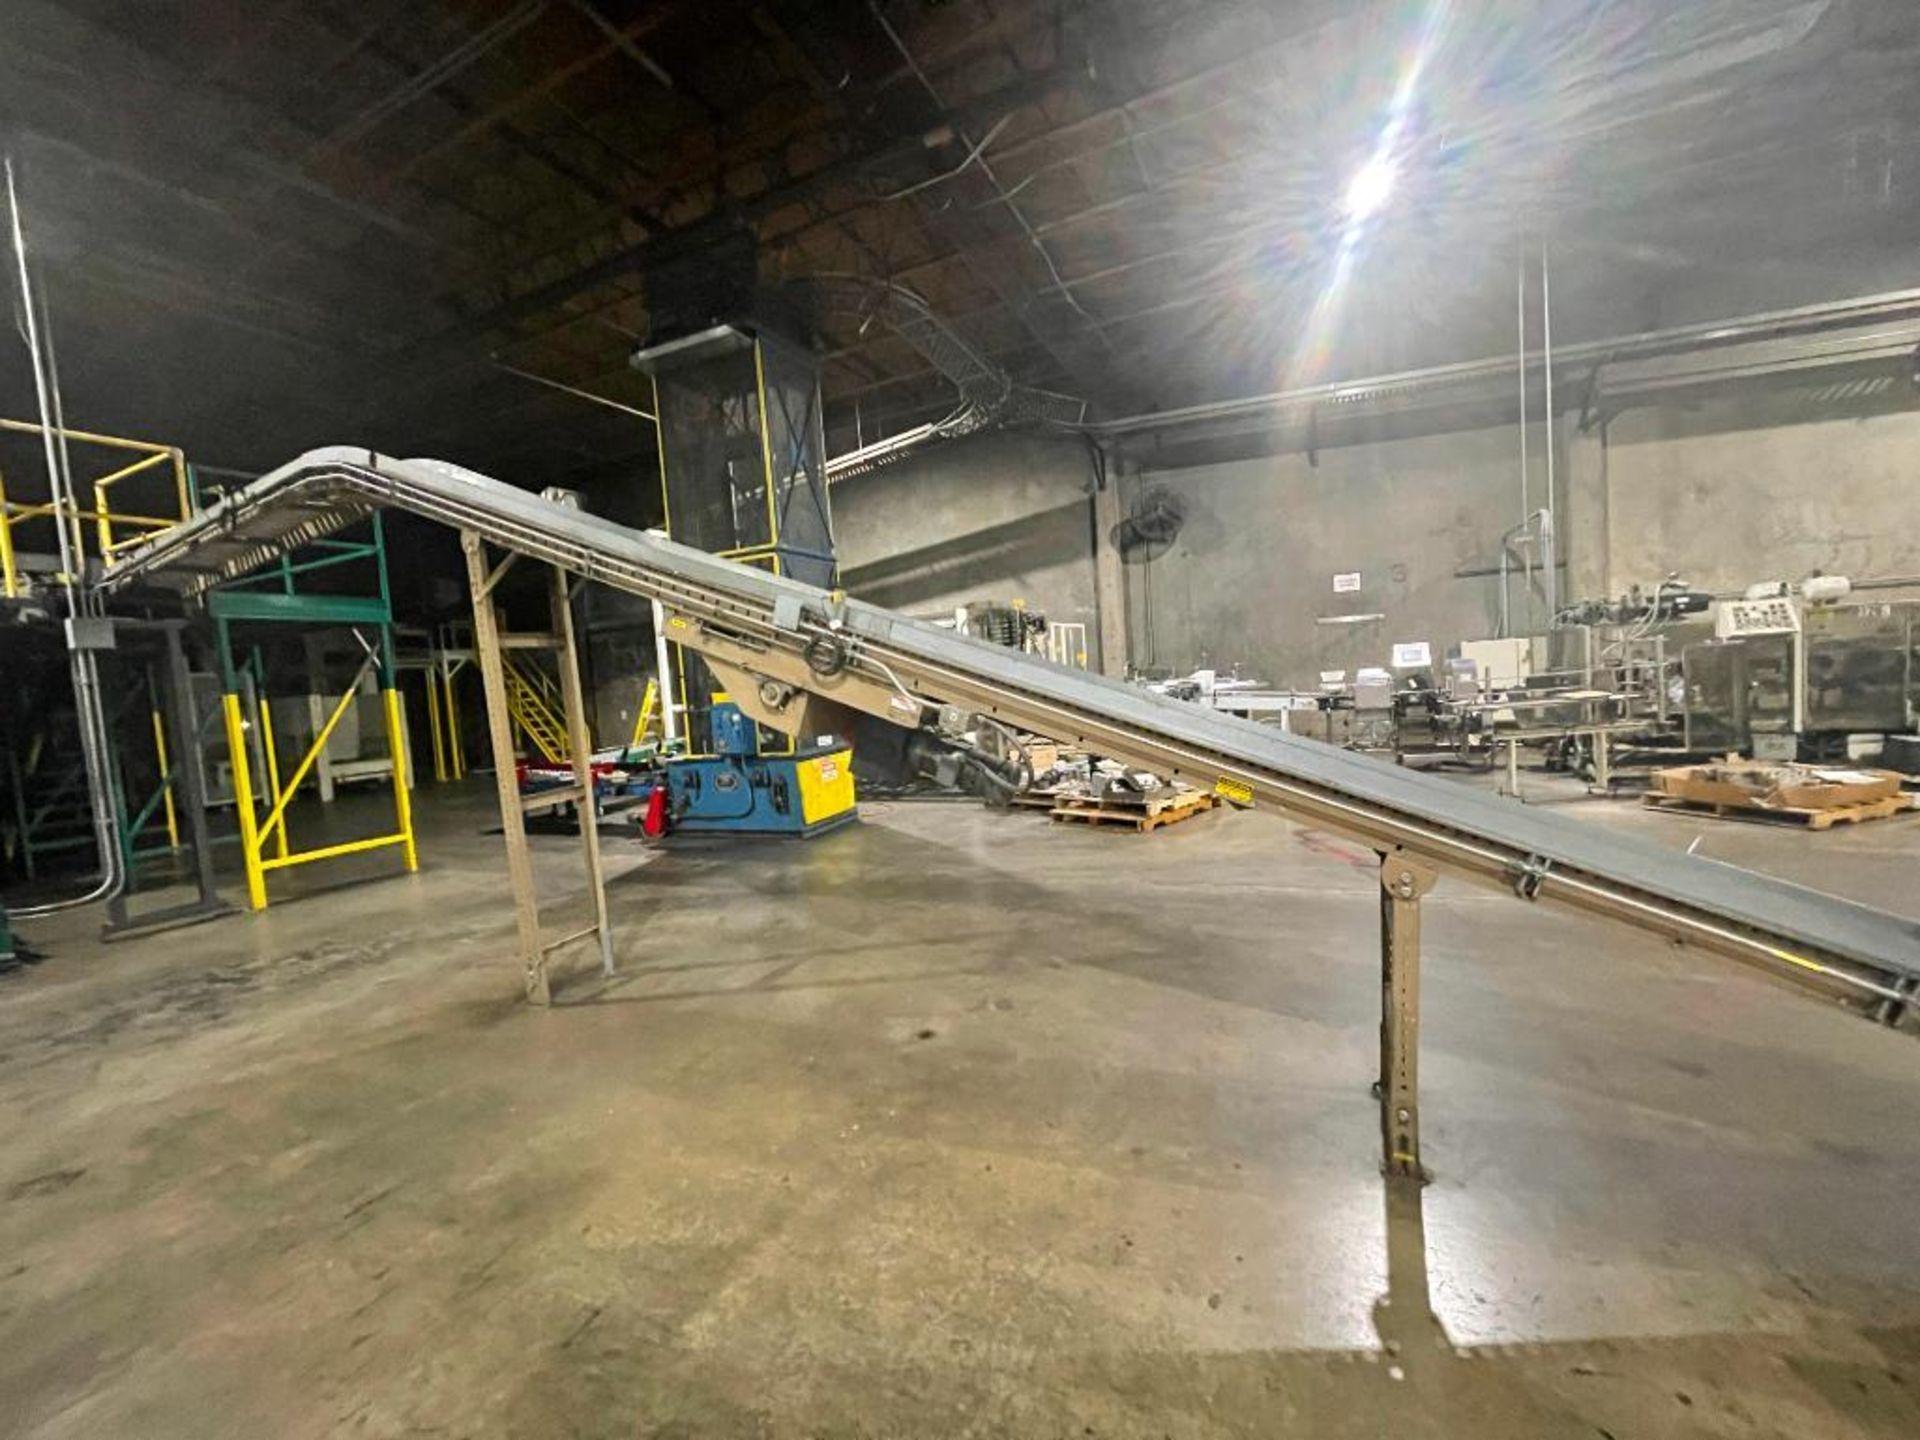 Mathews mild steel incline conveyor - Image 2 of 10